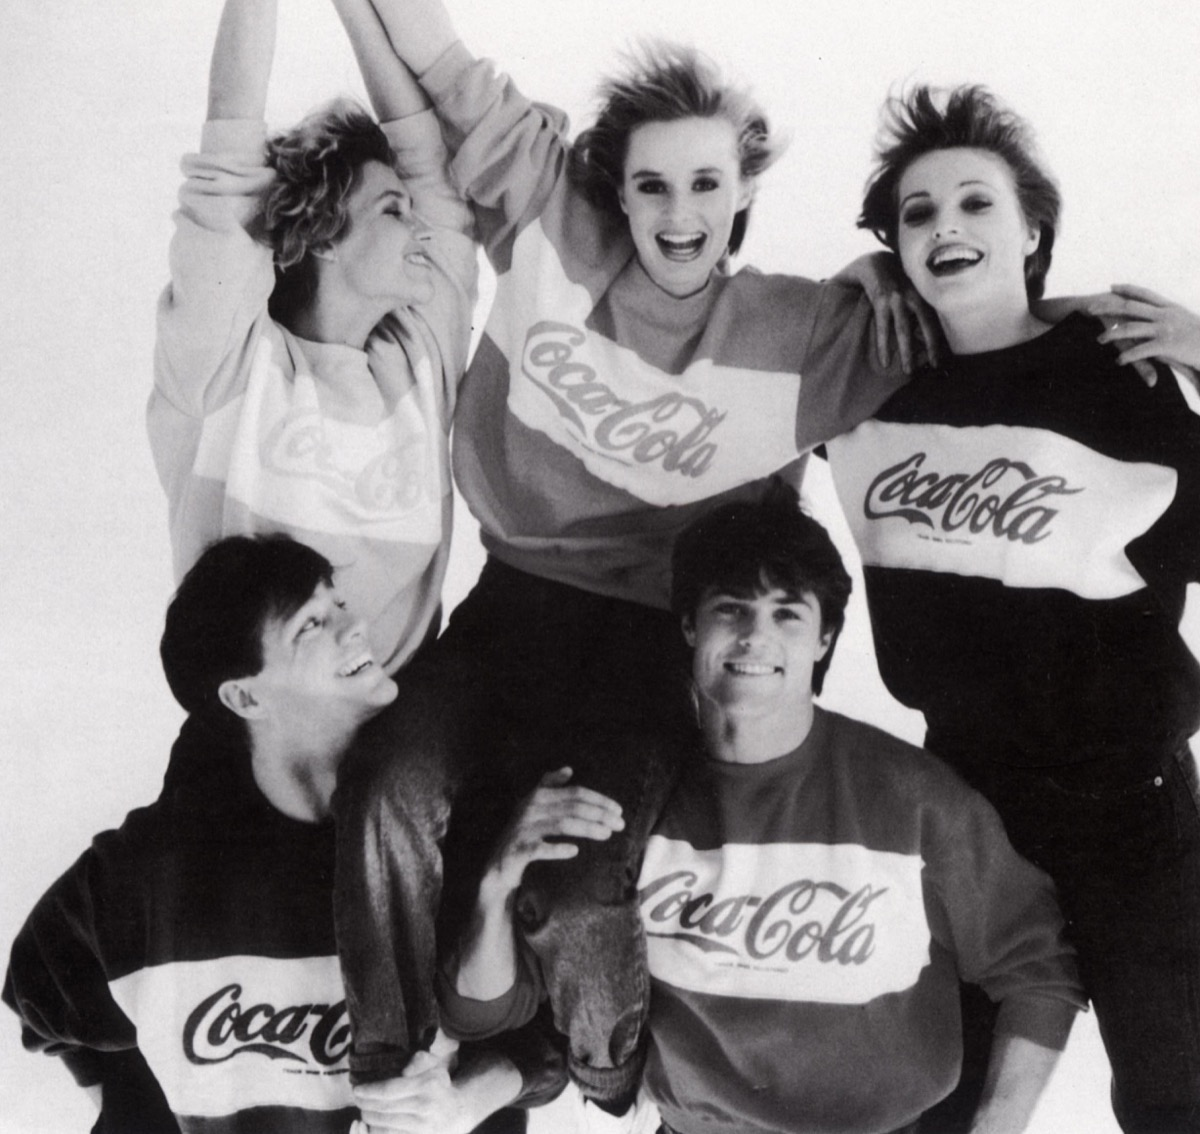 1980s USA Coca-Cola Promotional